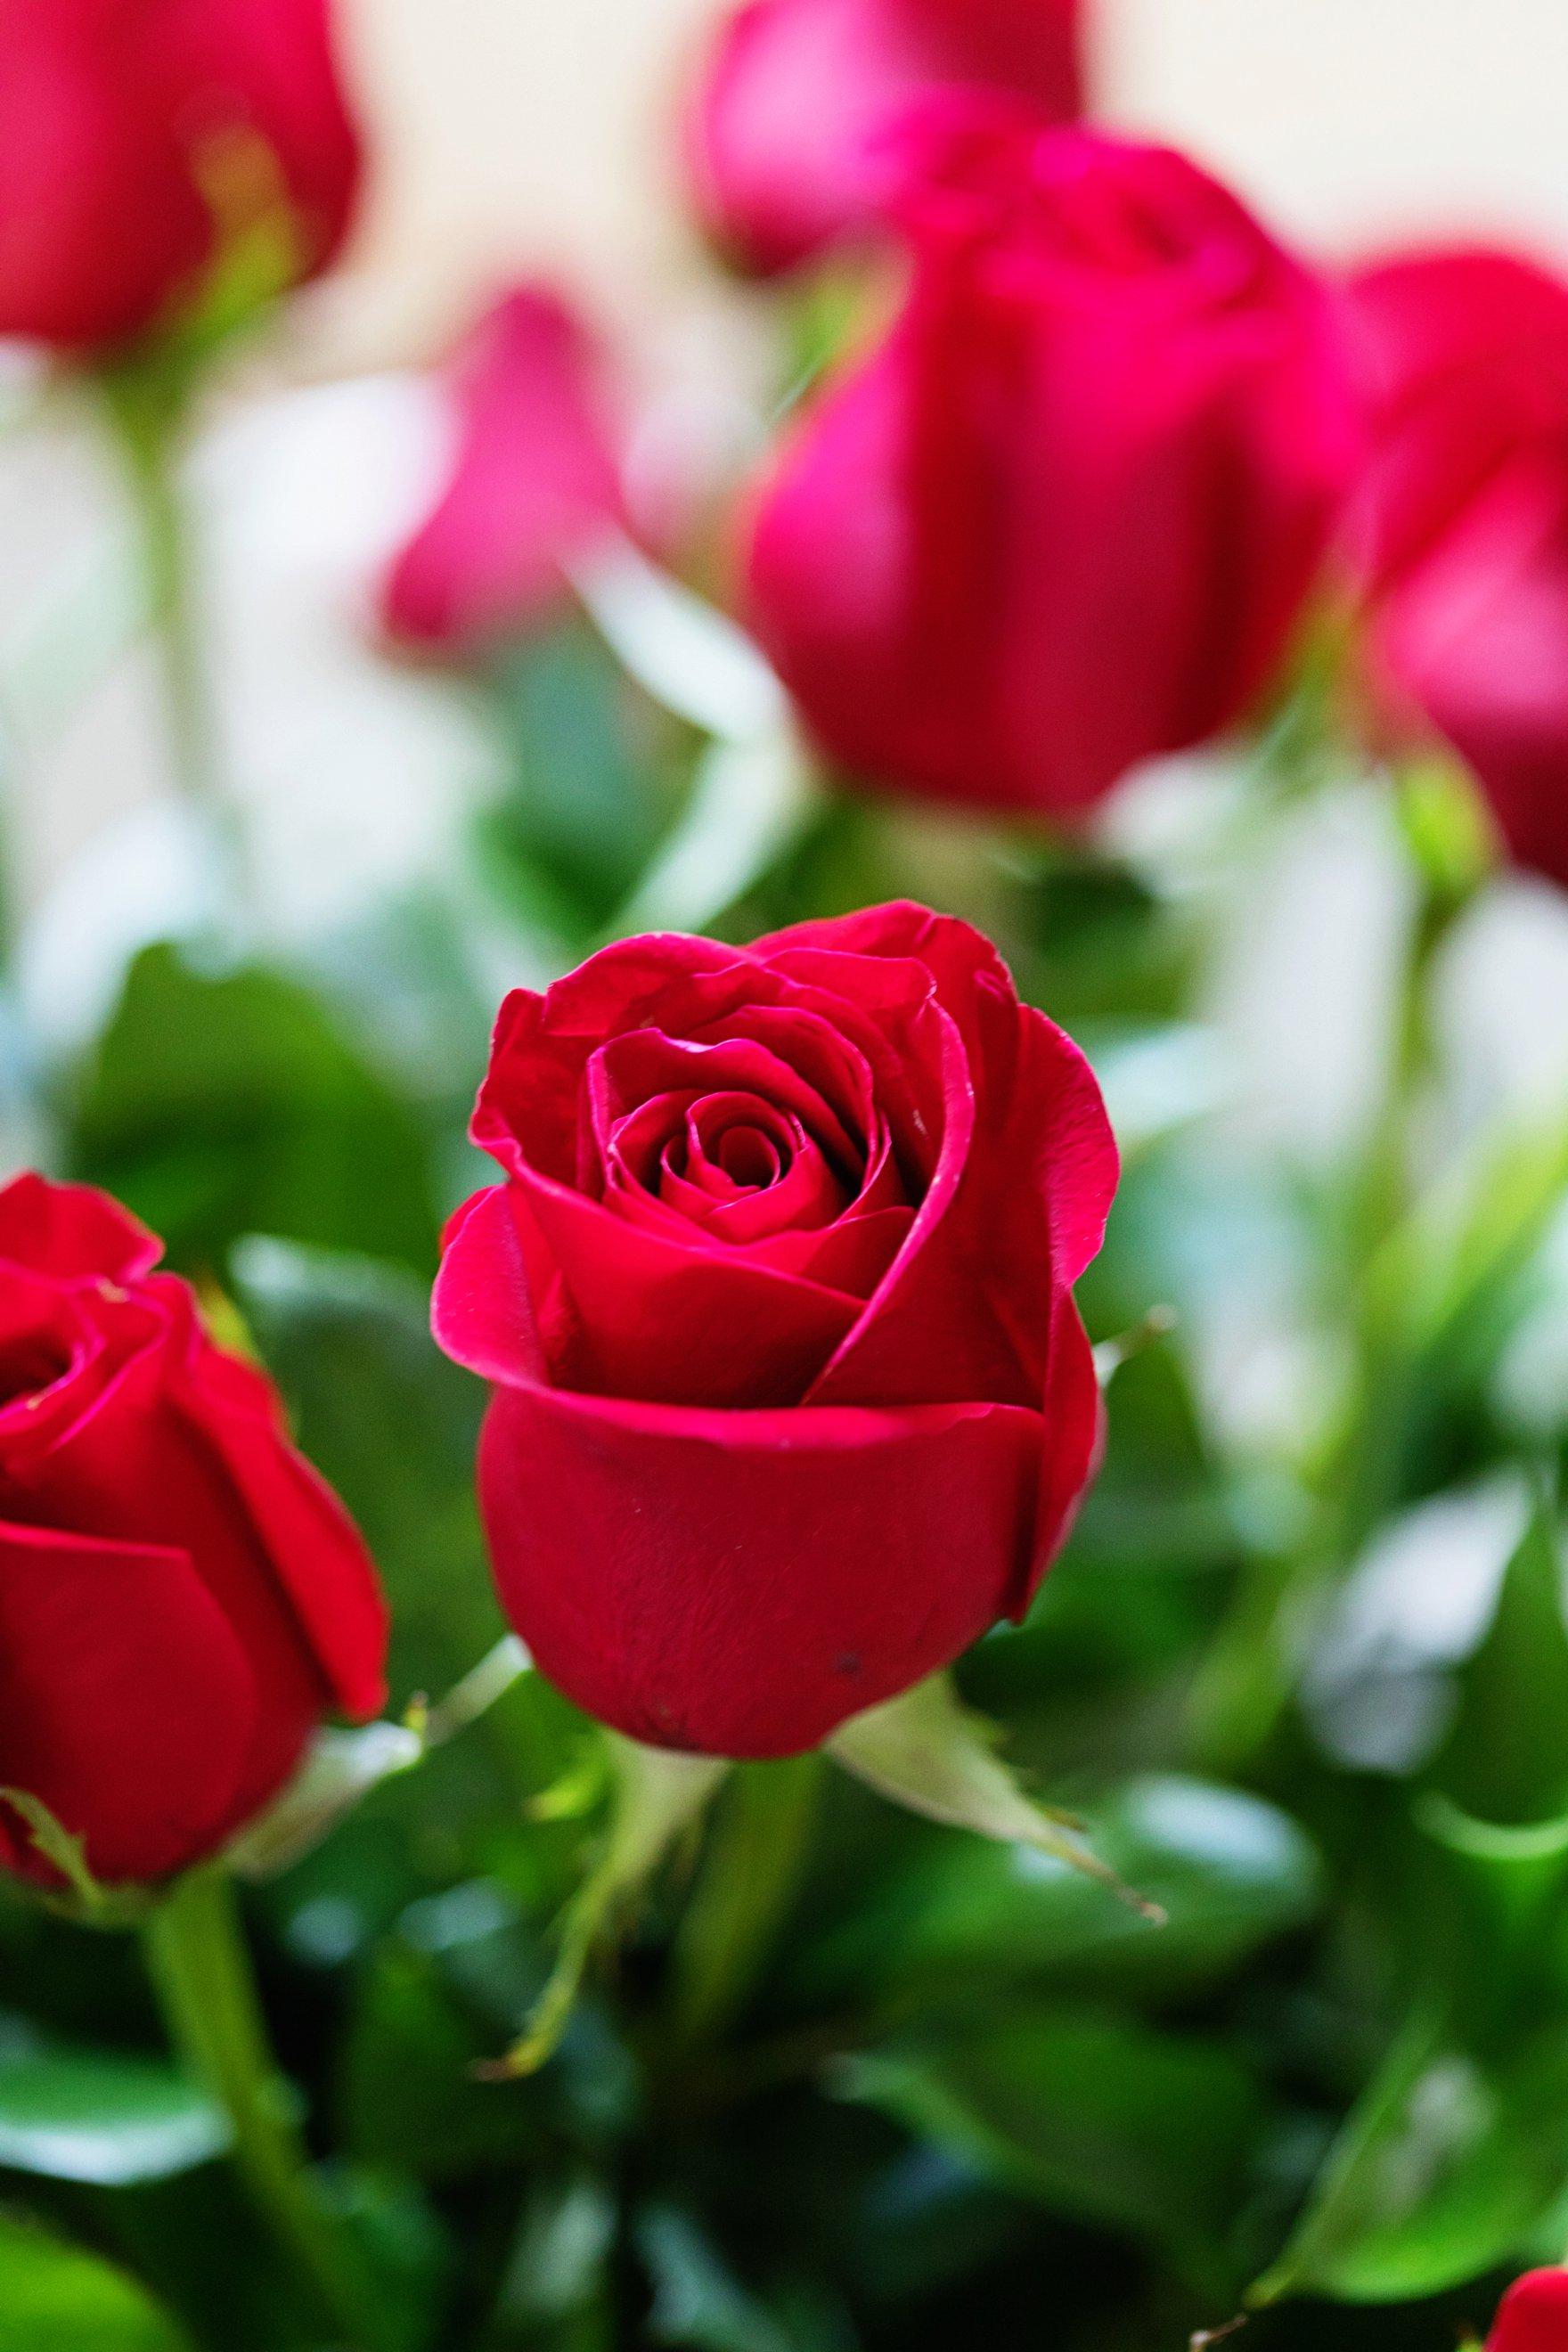 FTD two dozen roses for valentine's day